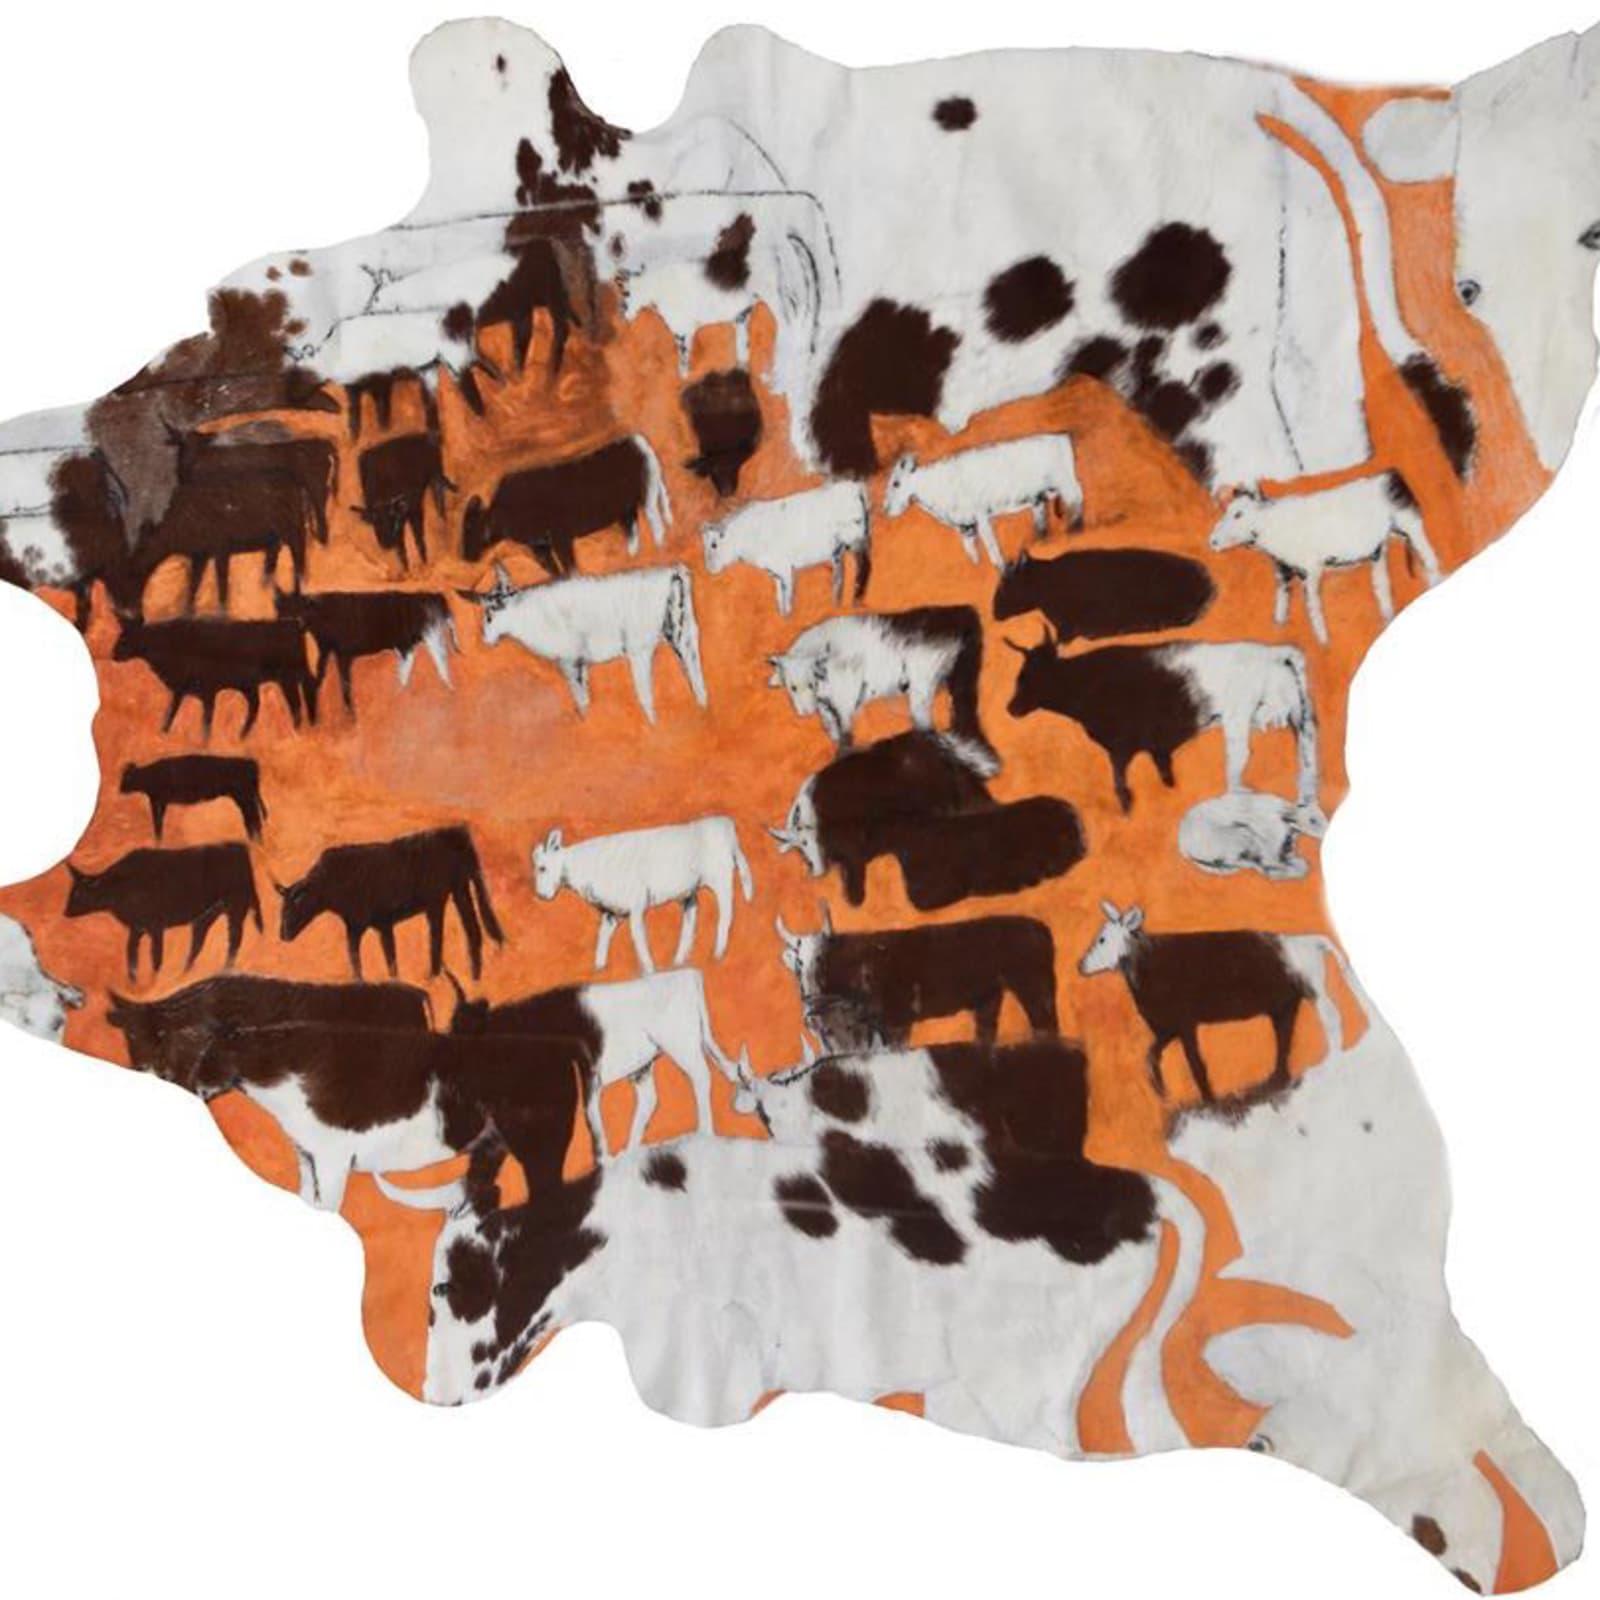 Mervyn Street  Short Horn Cow Hide, 2019  Acrylic paint on carved cow hide  210 x 190 cm